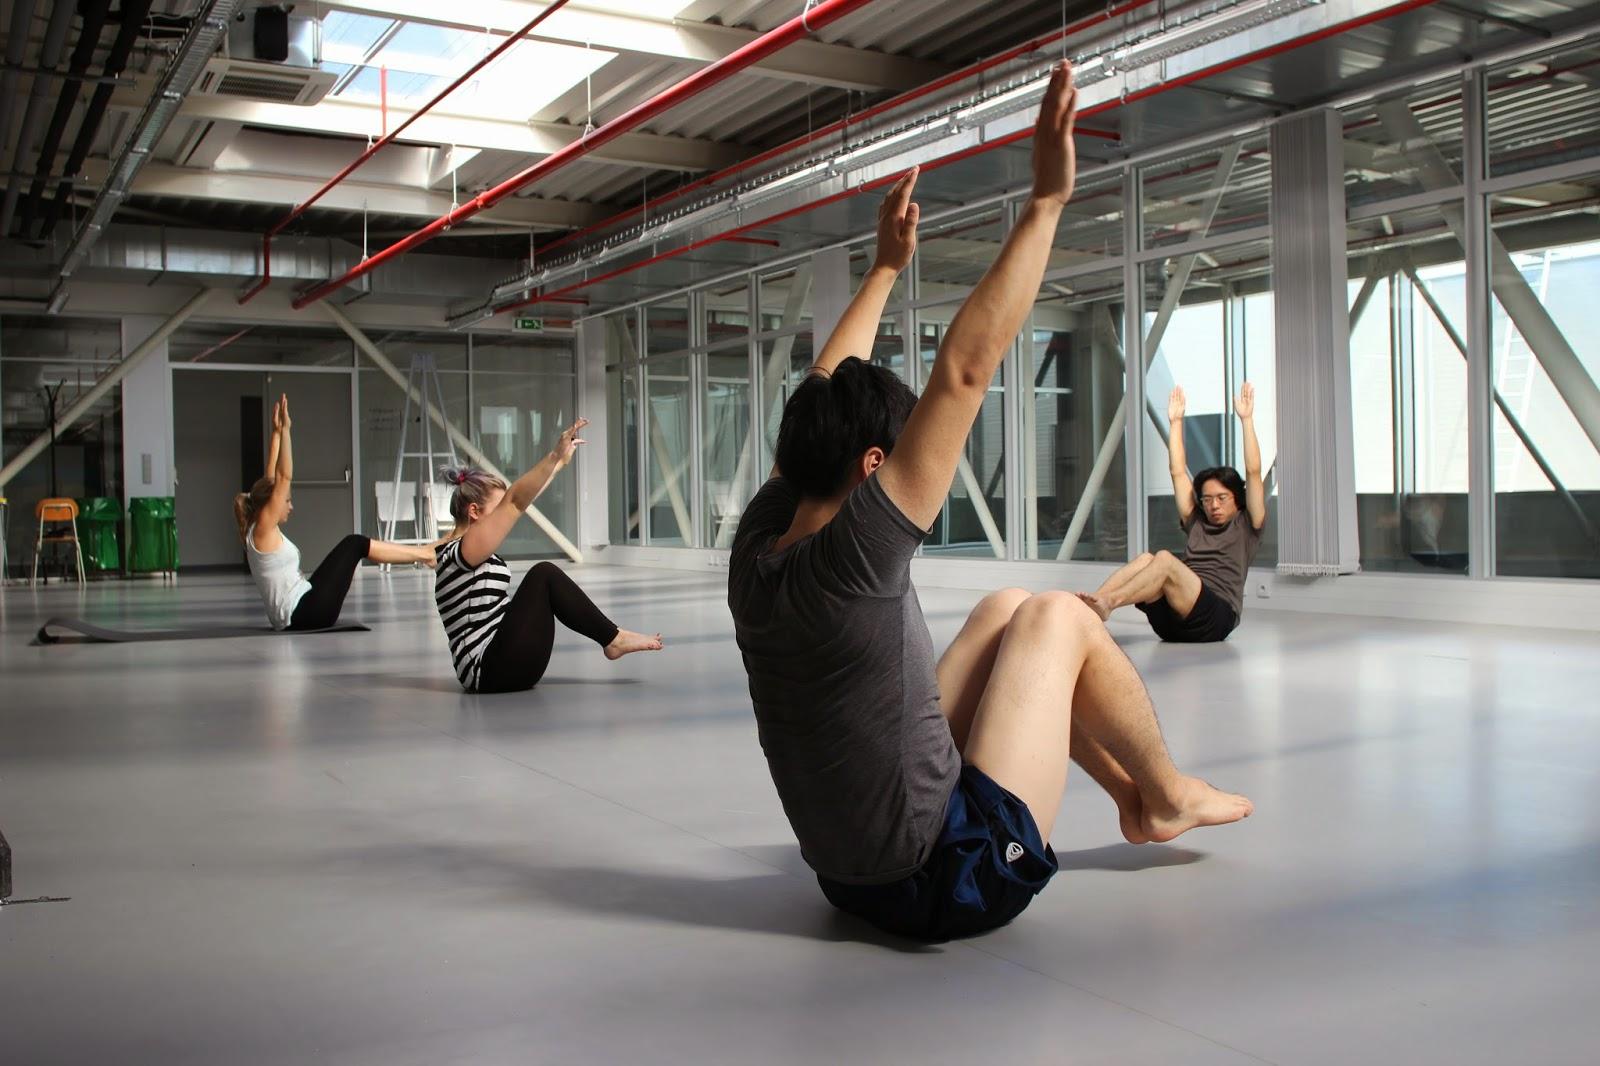 ArtCamp 2014, Tělo, pohyb, tanec / Body, movement, dance